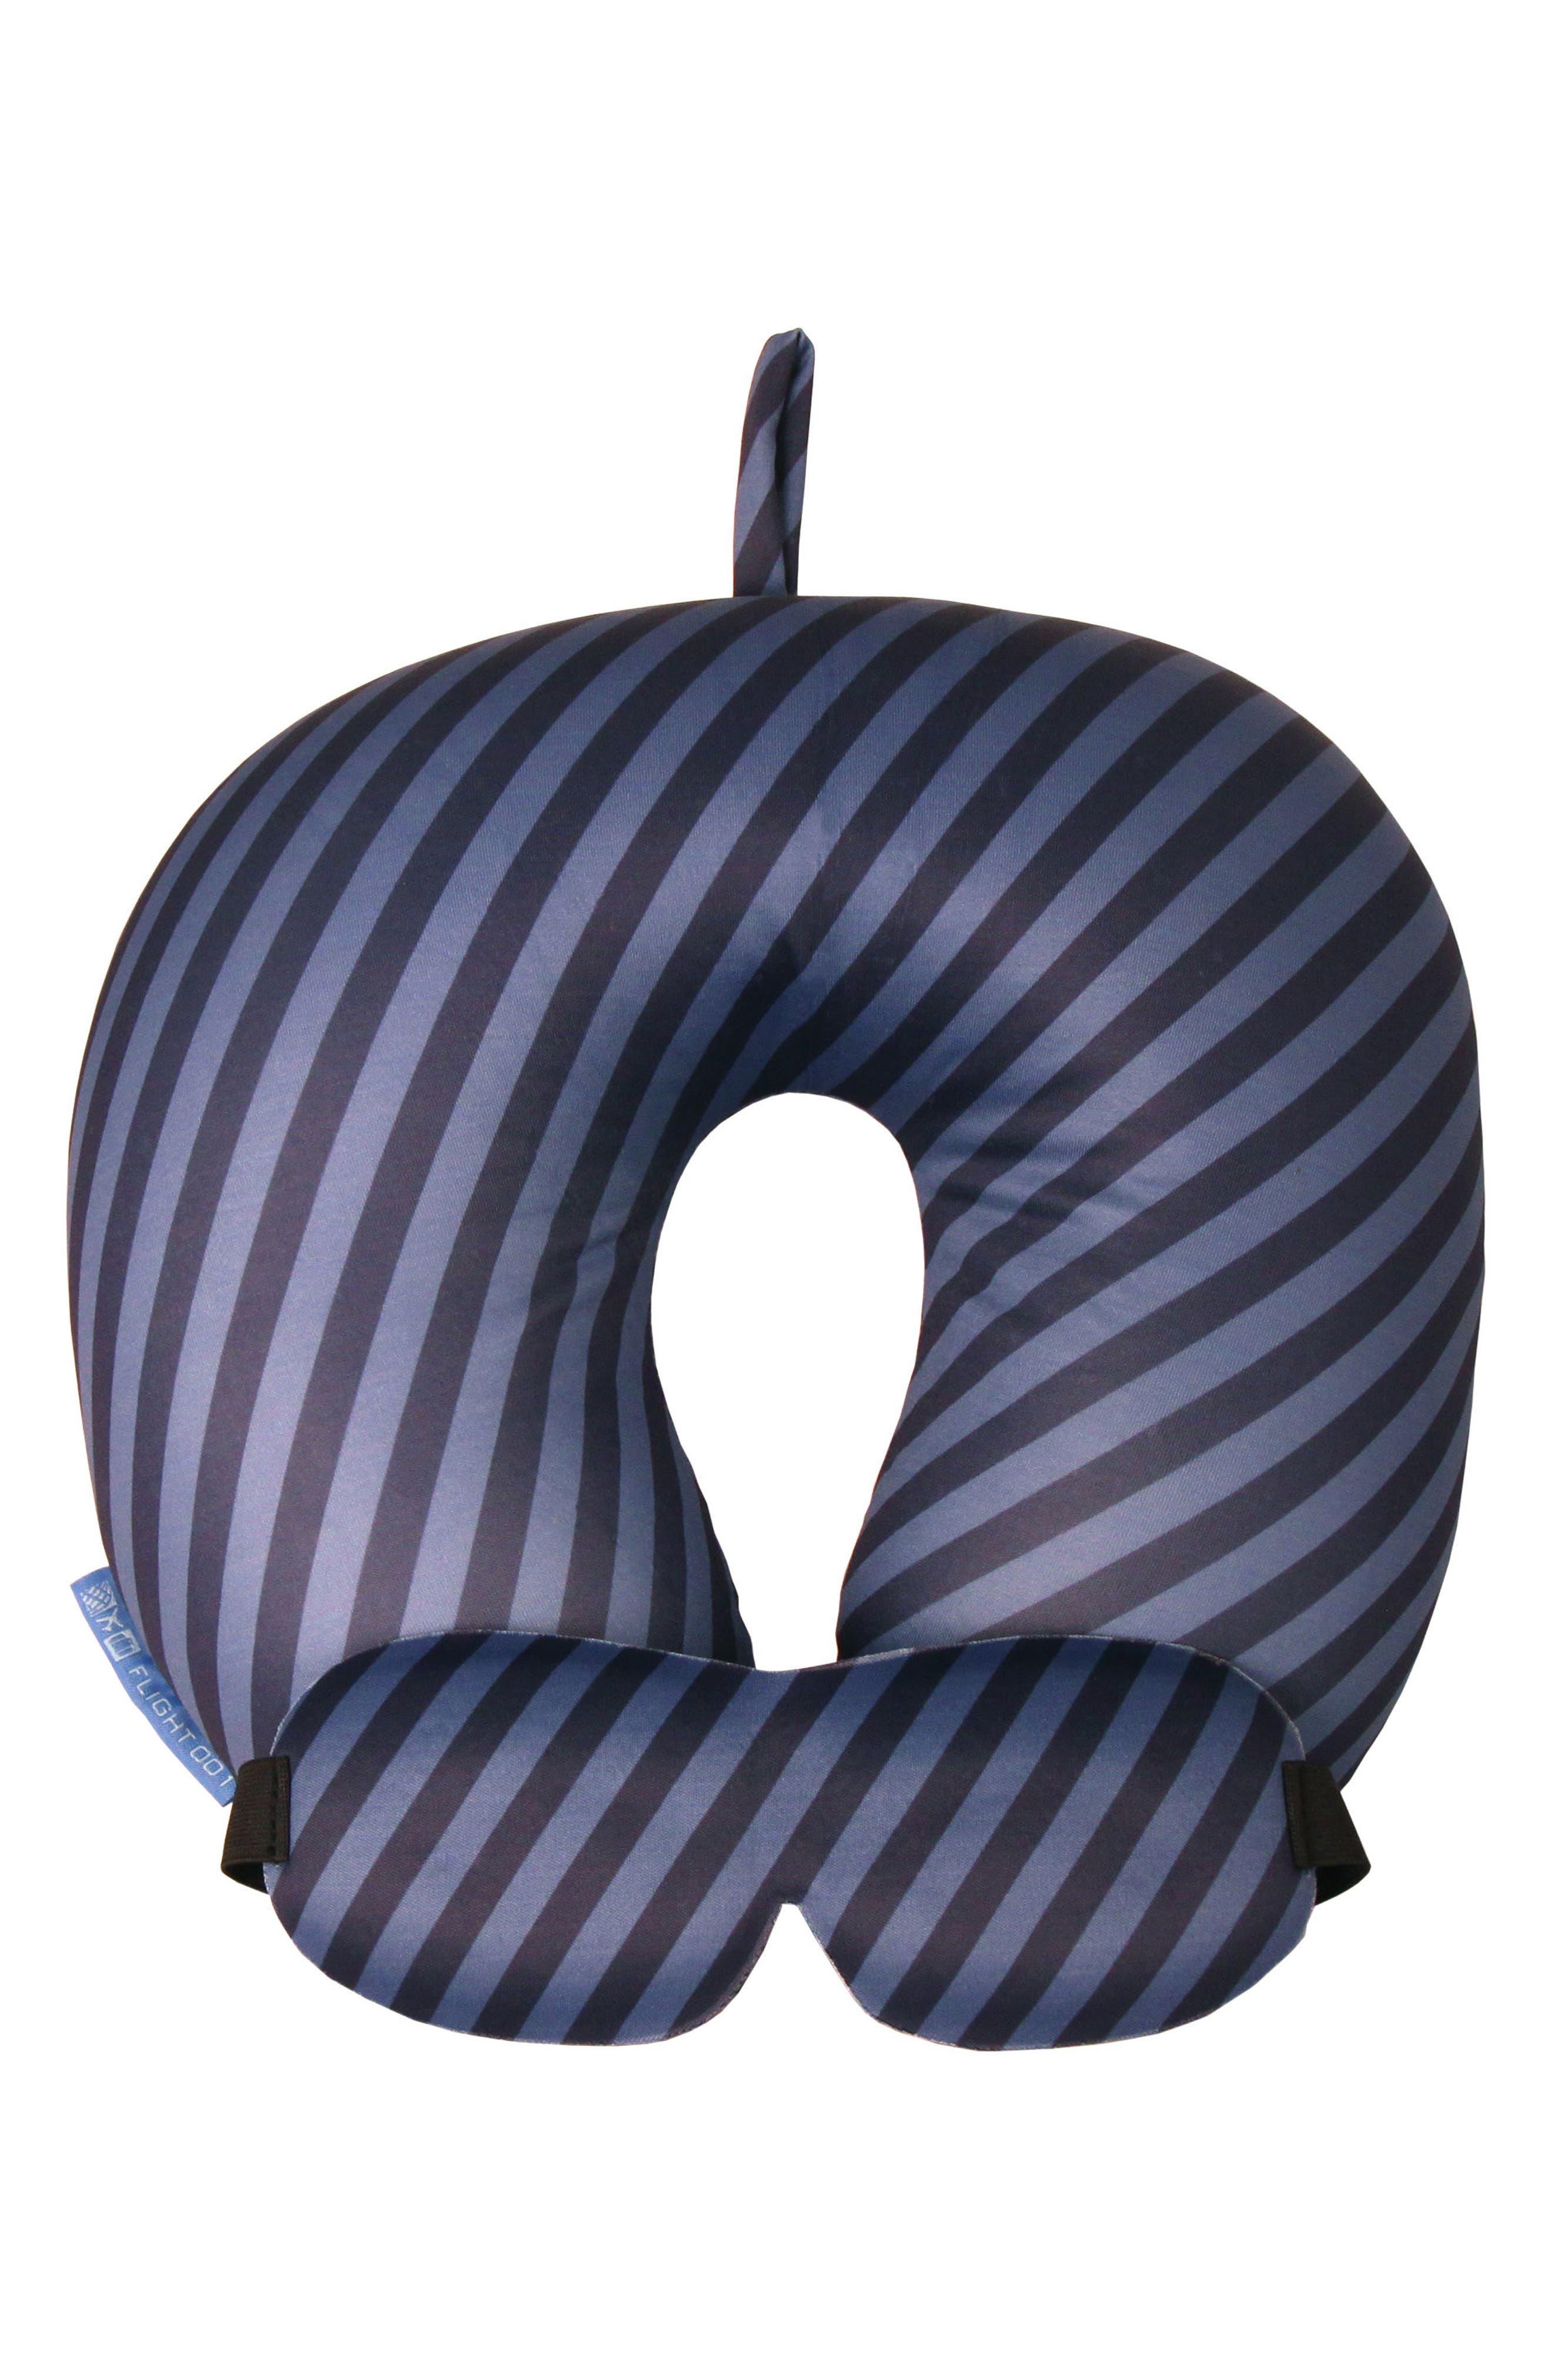 Neck Pillow & Eye Mask Set,                         Main,                         color, Mailstripe Indigo